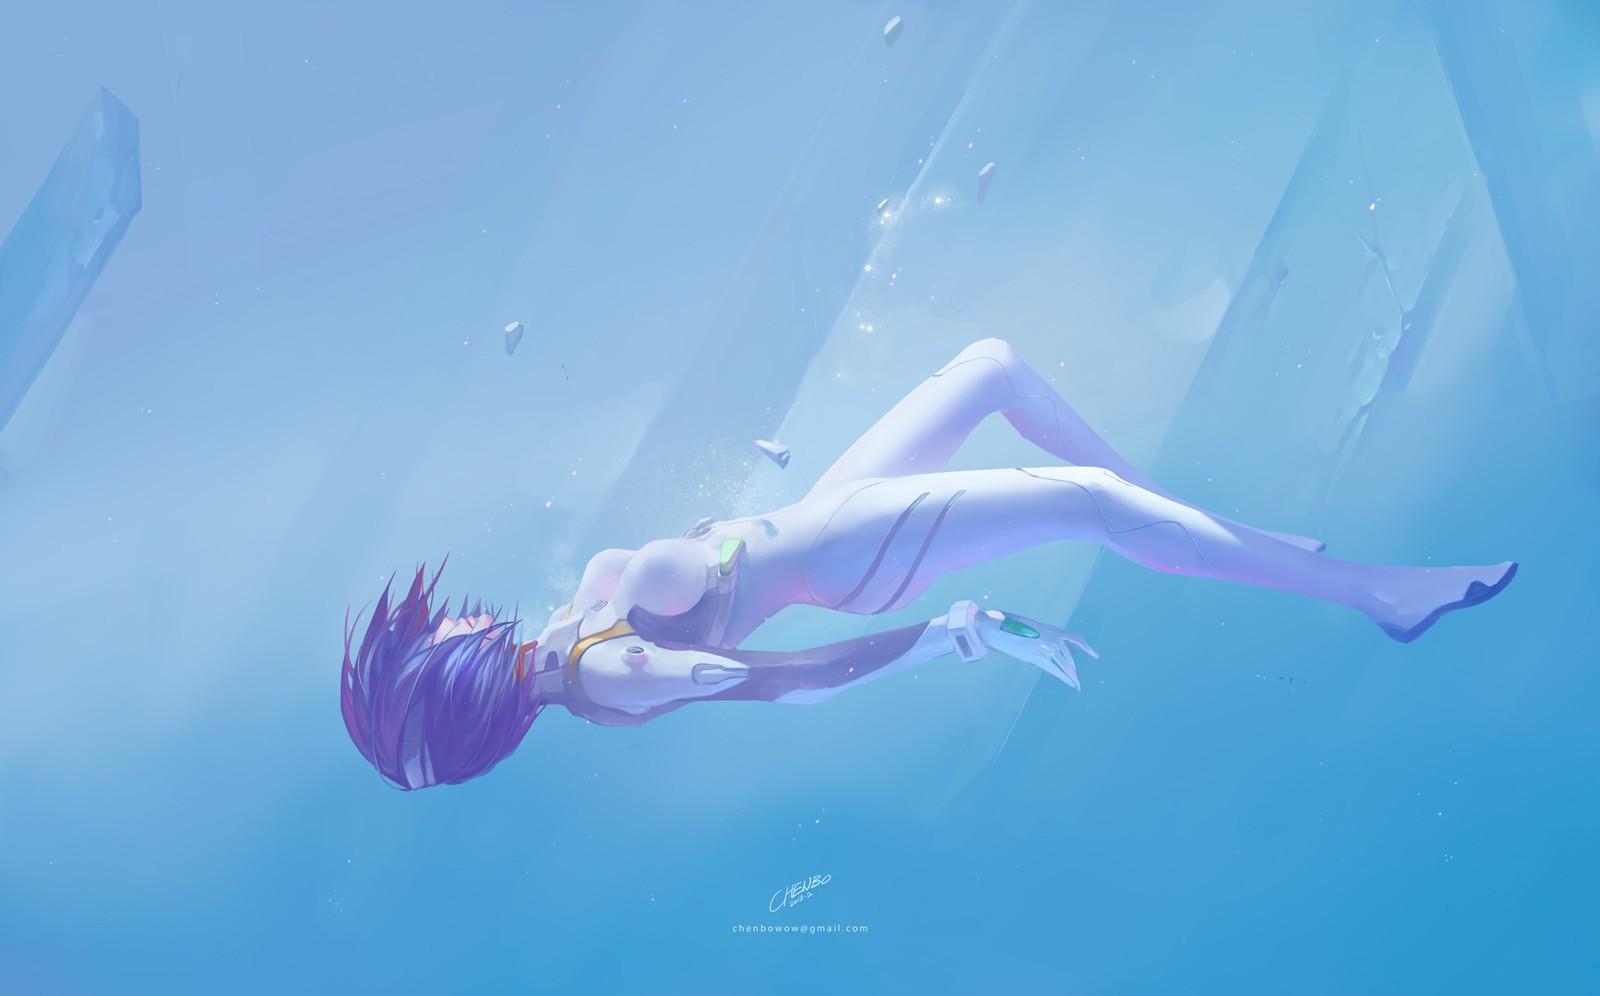 Anime 1600x996 underwater anime girls artwork Neon Genesis Evangelion Ayanami Rei plugsuit Chenbo thighs small boobs short hair 2D blue hair